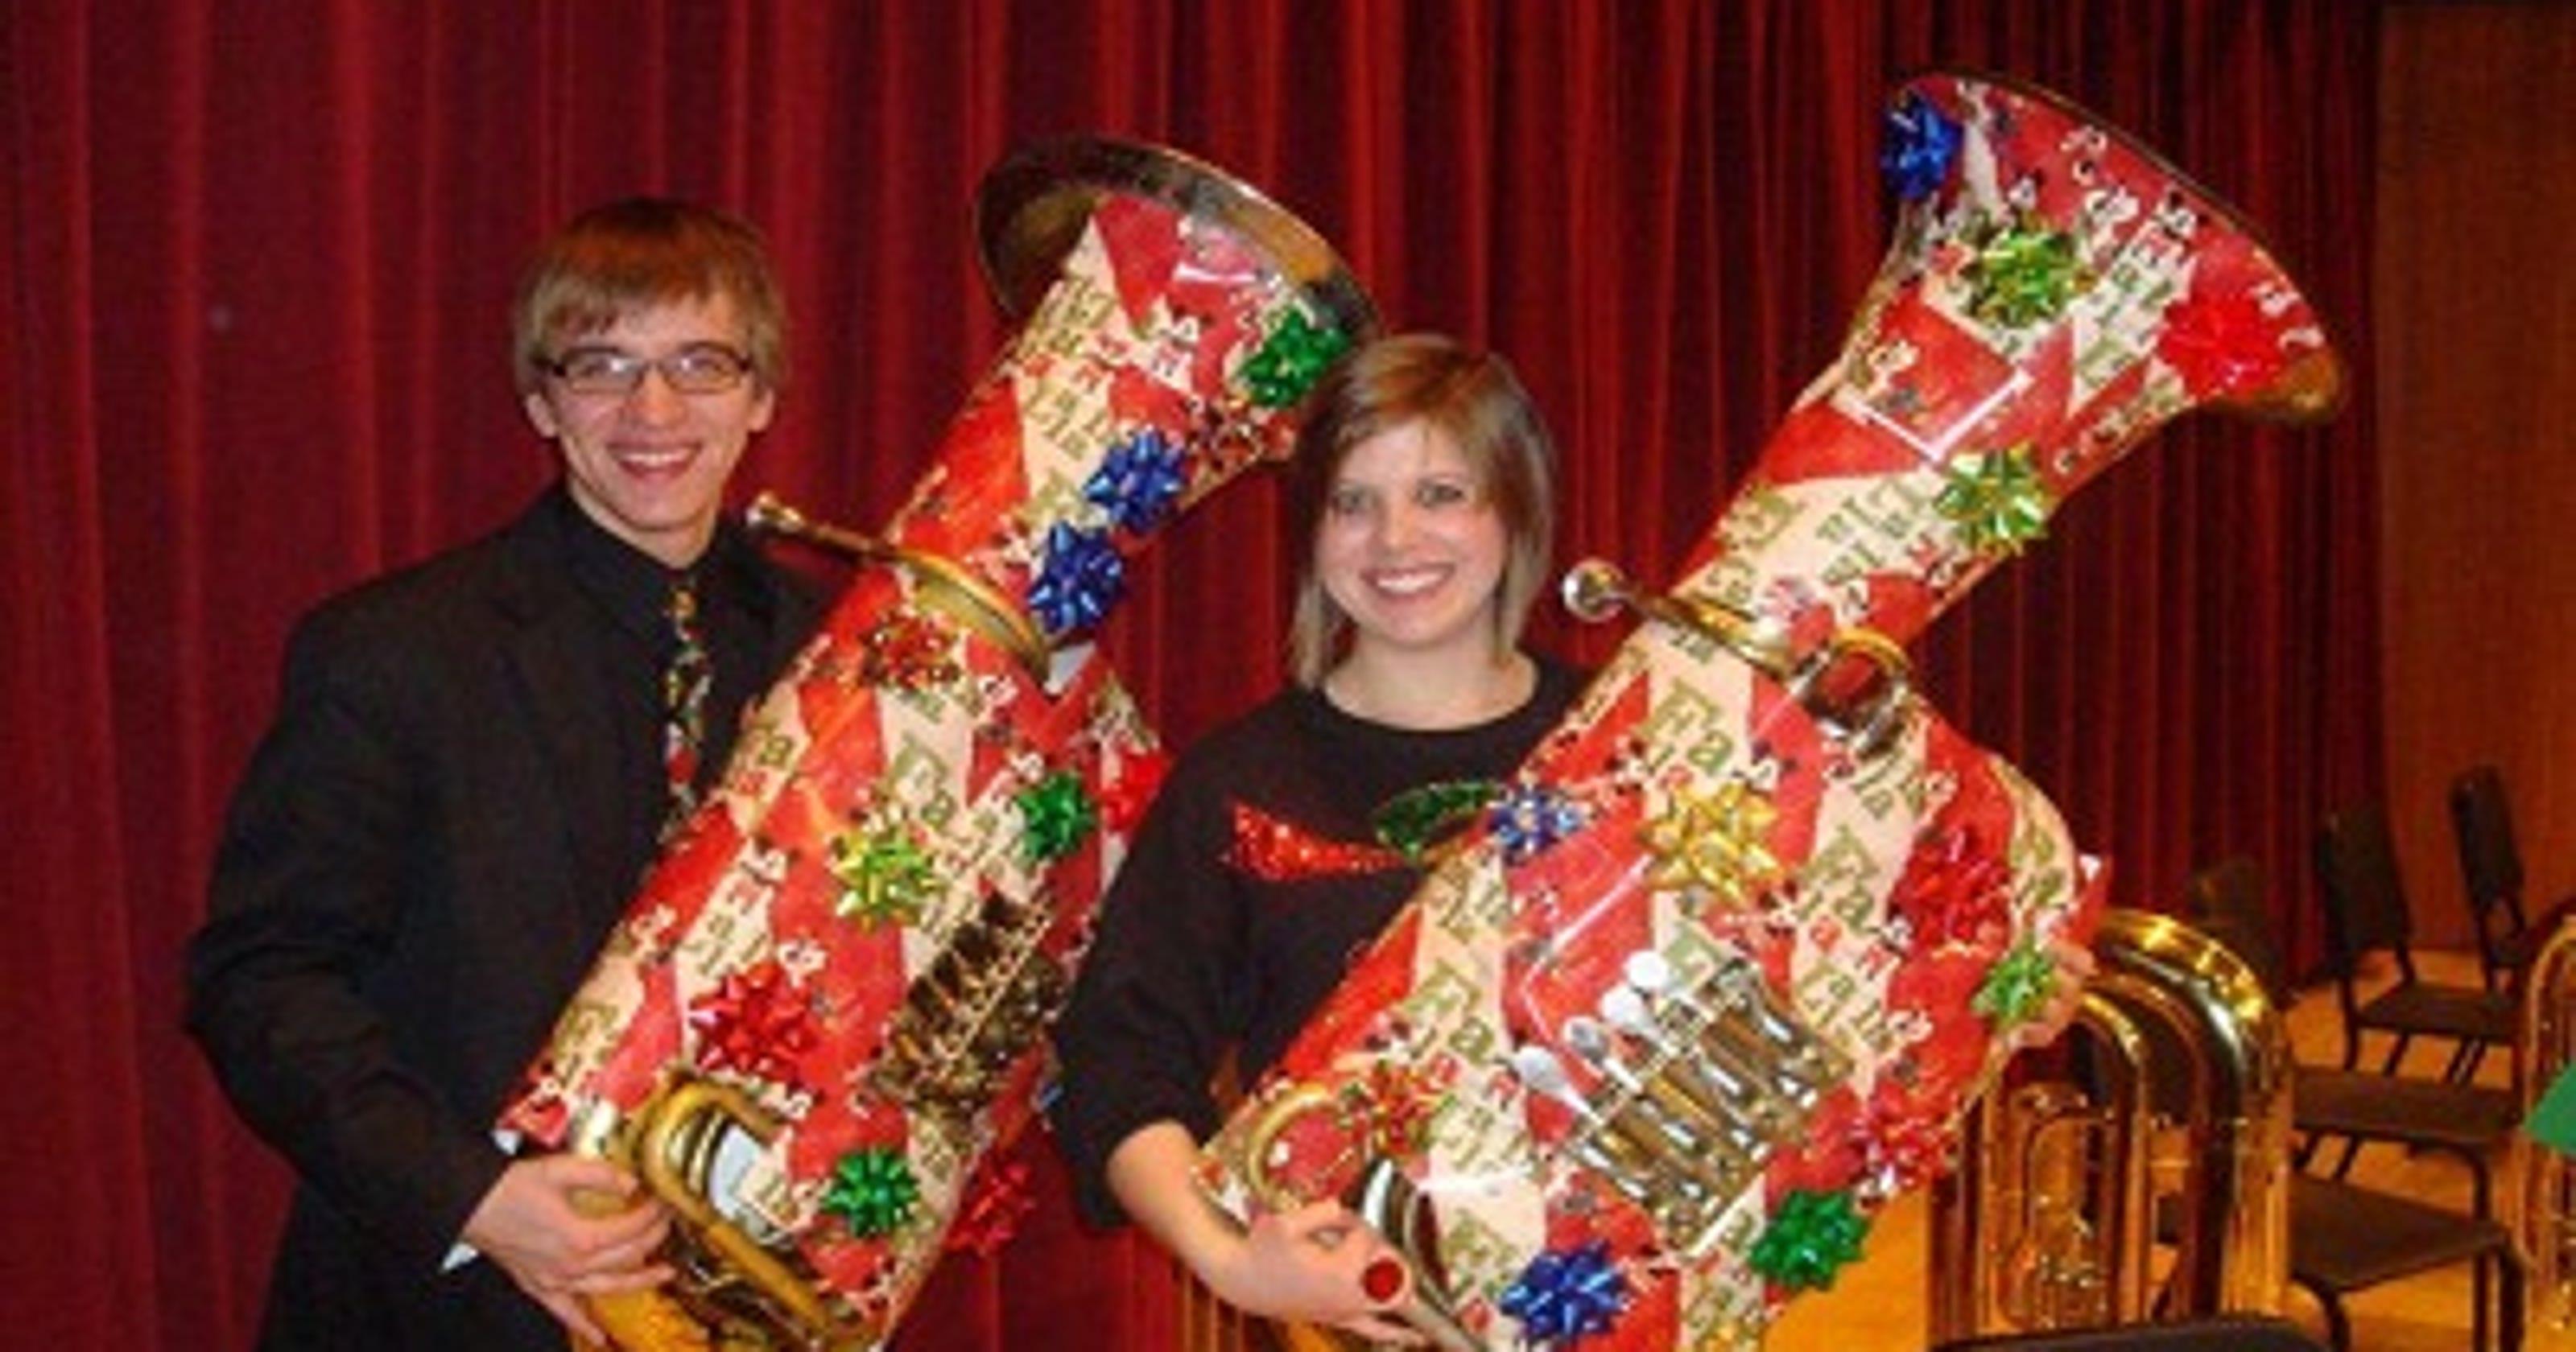 Tuba Christmas.Uw Stevens Point To Host Tuba Christmas